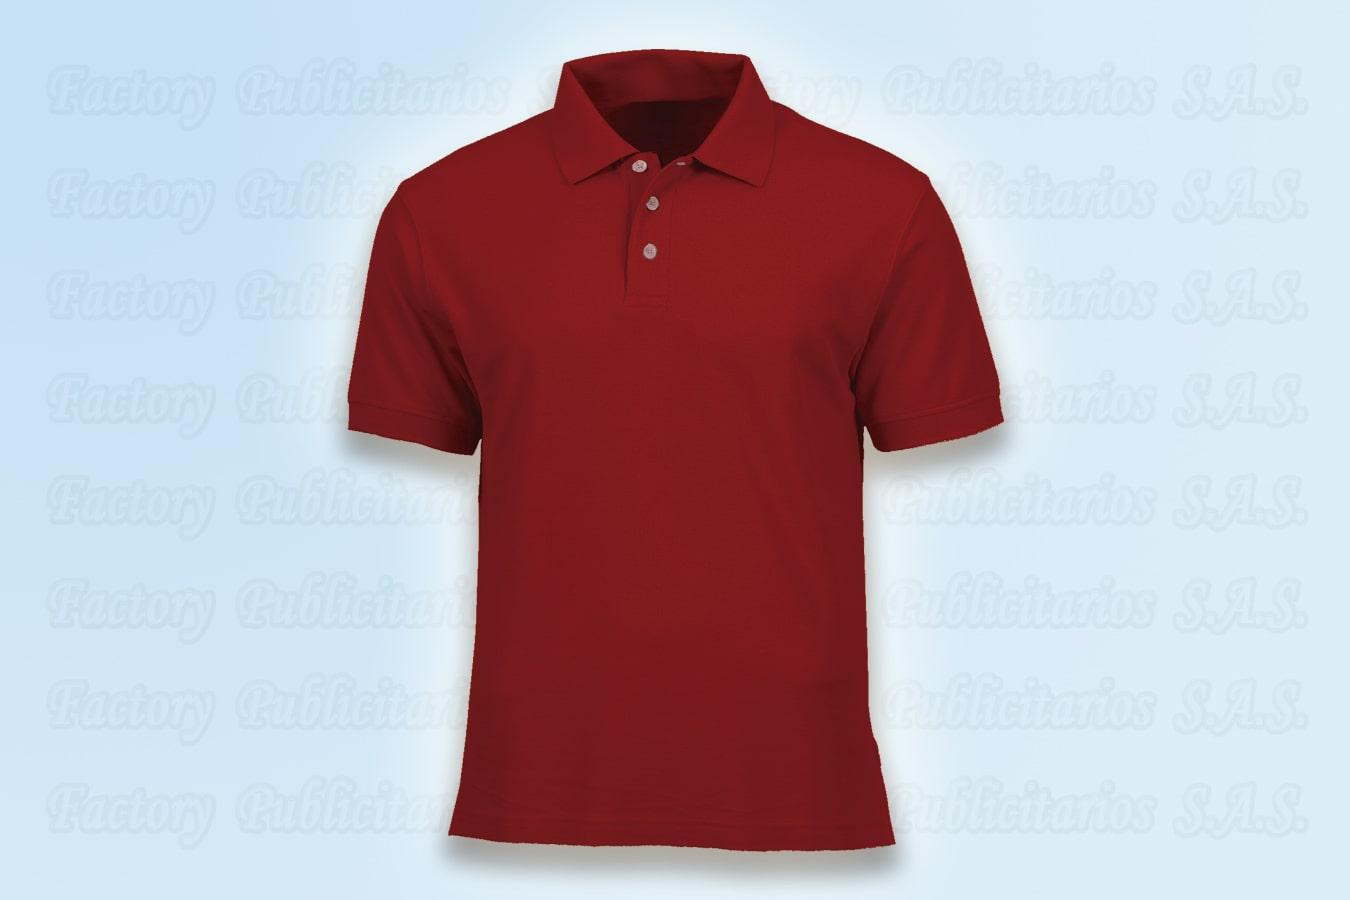 Camisetas polo rojas publicitarias